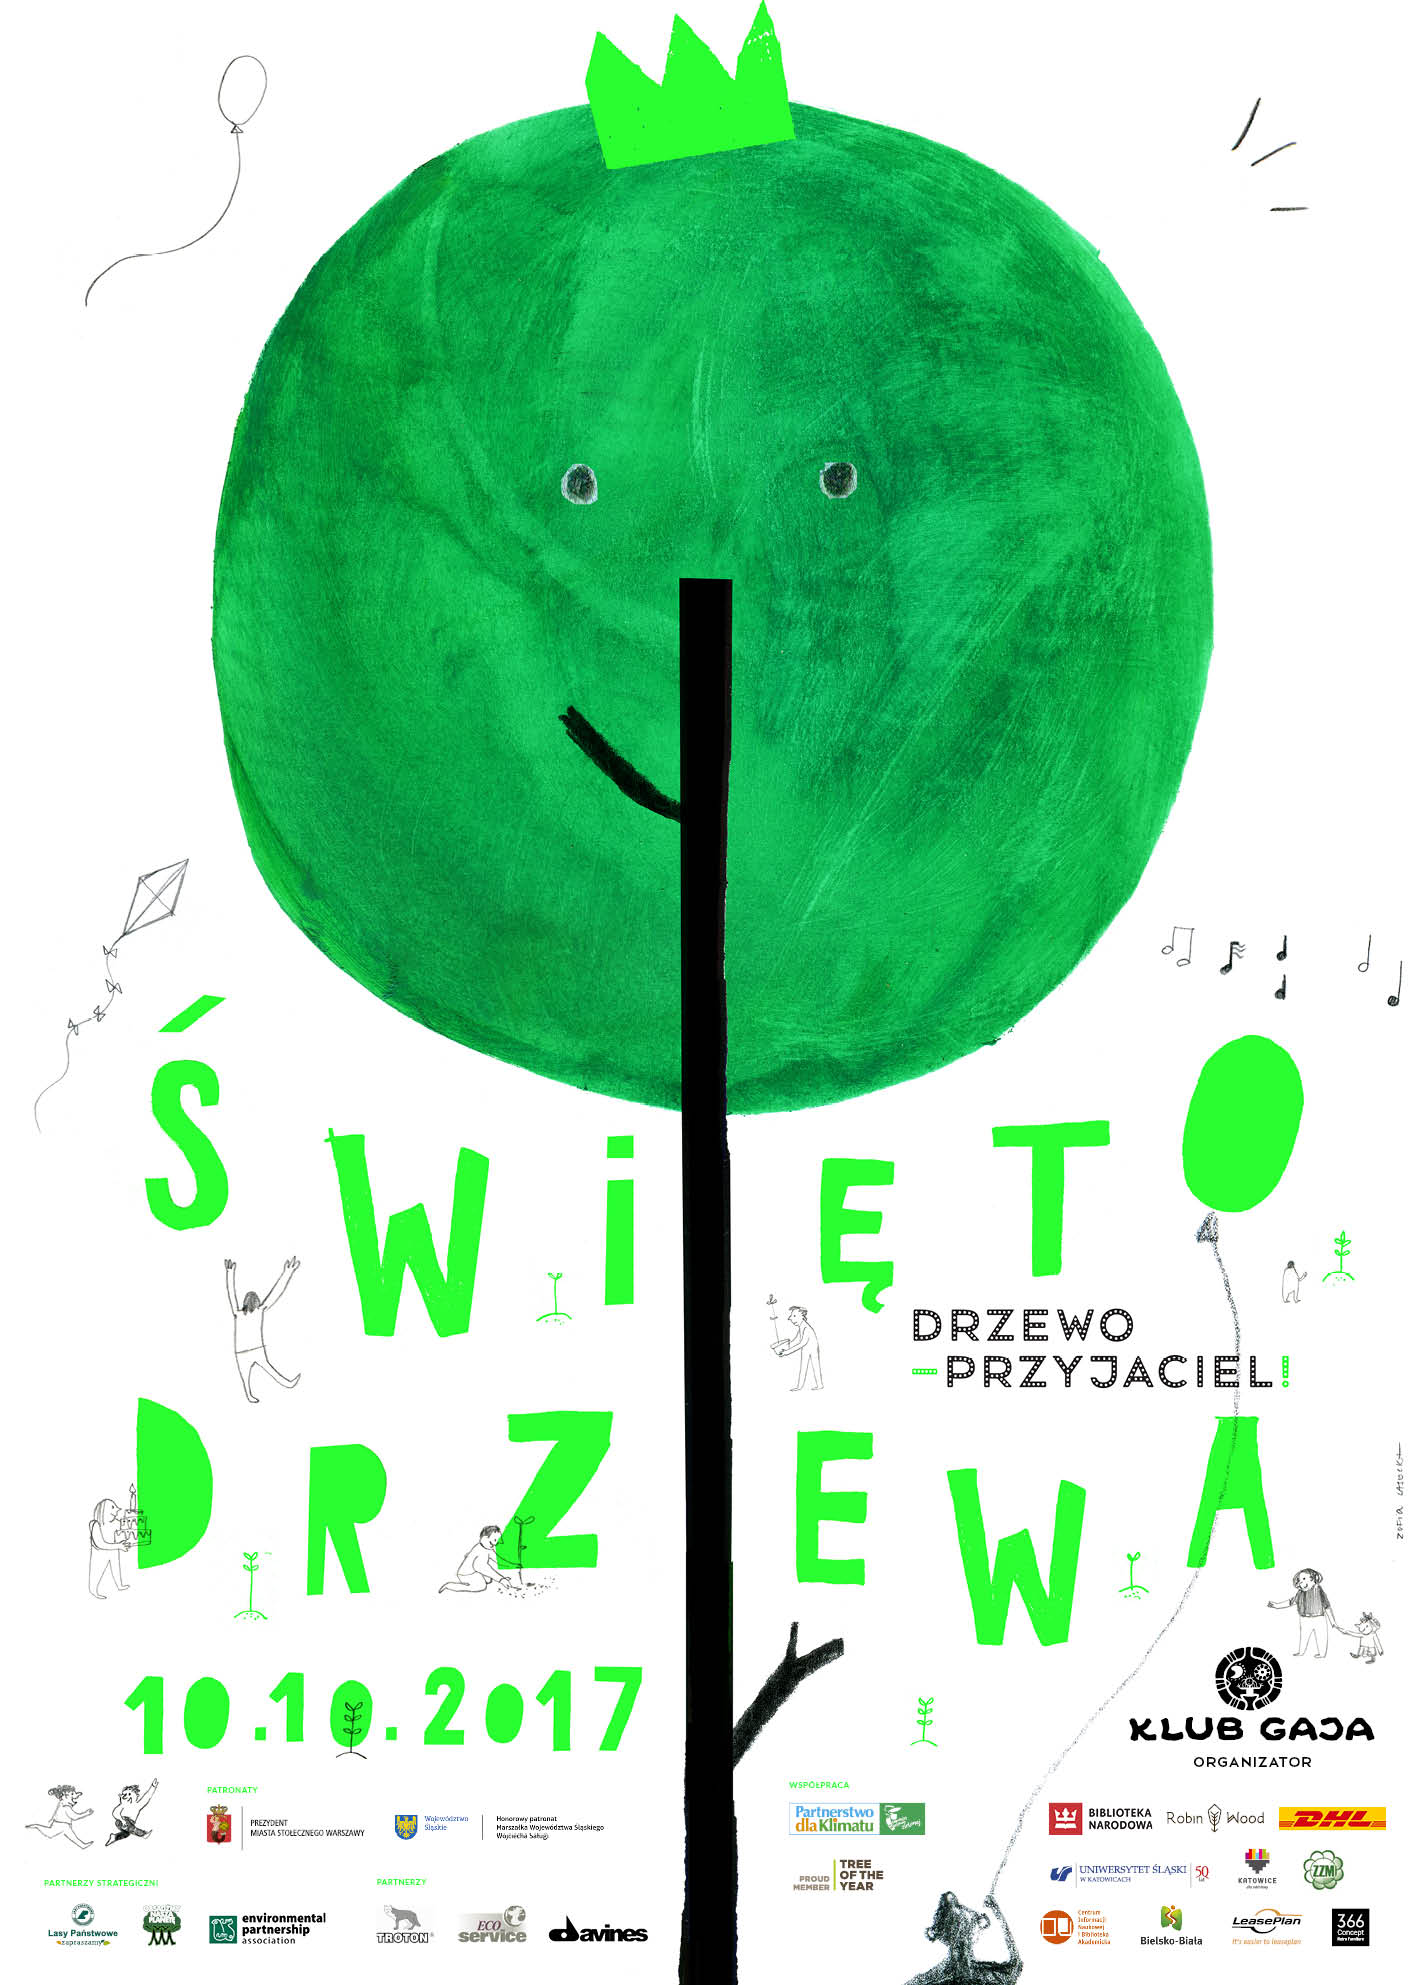 plakat-swieto-drzewa-2017-2